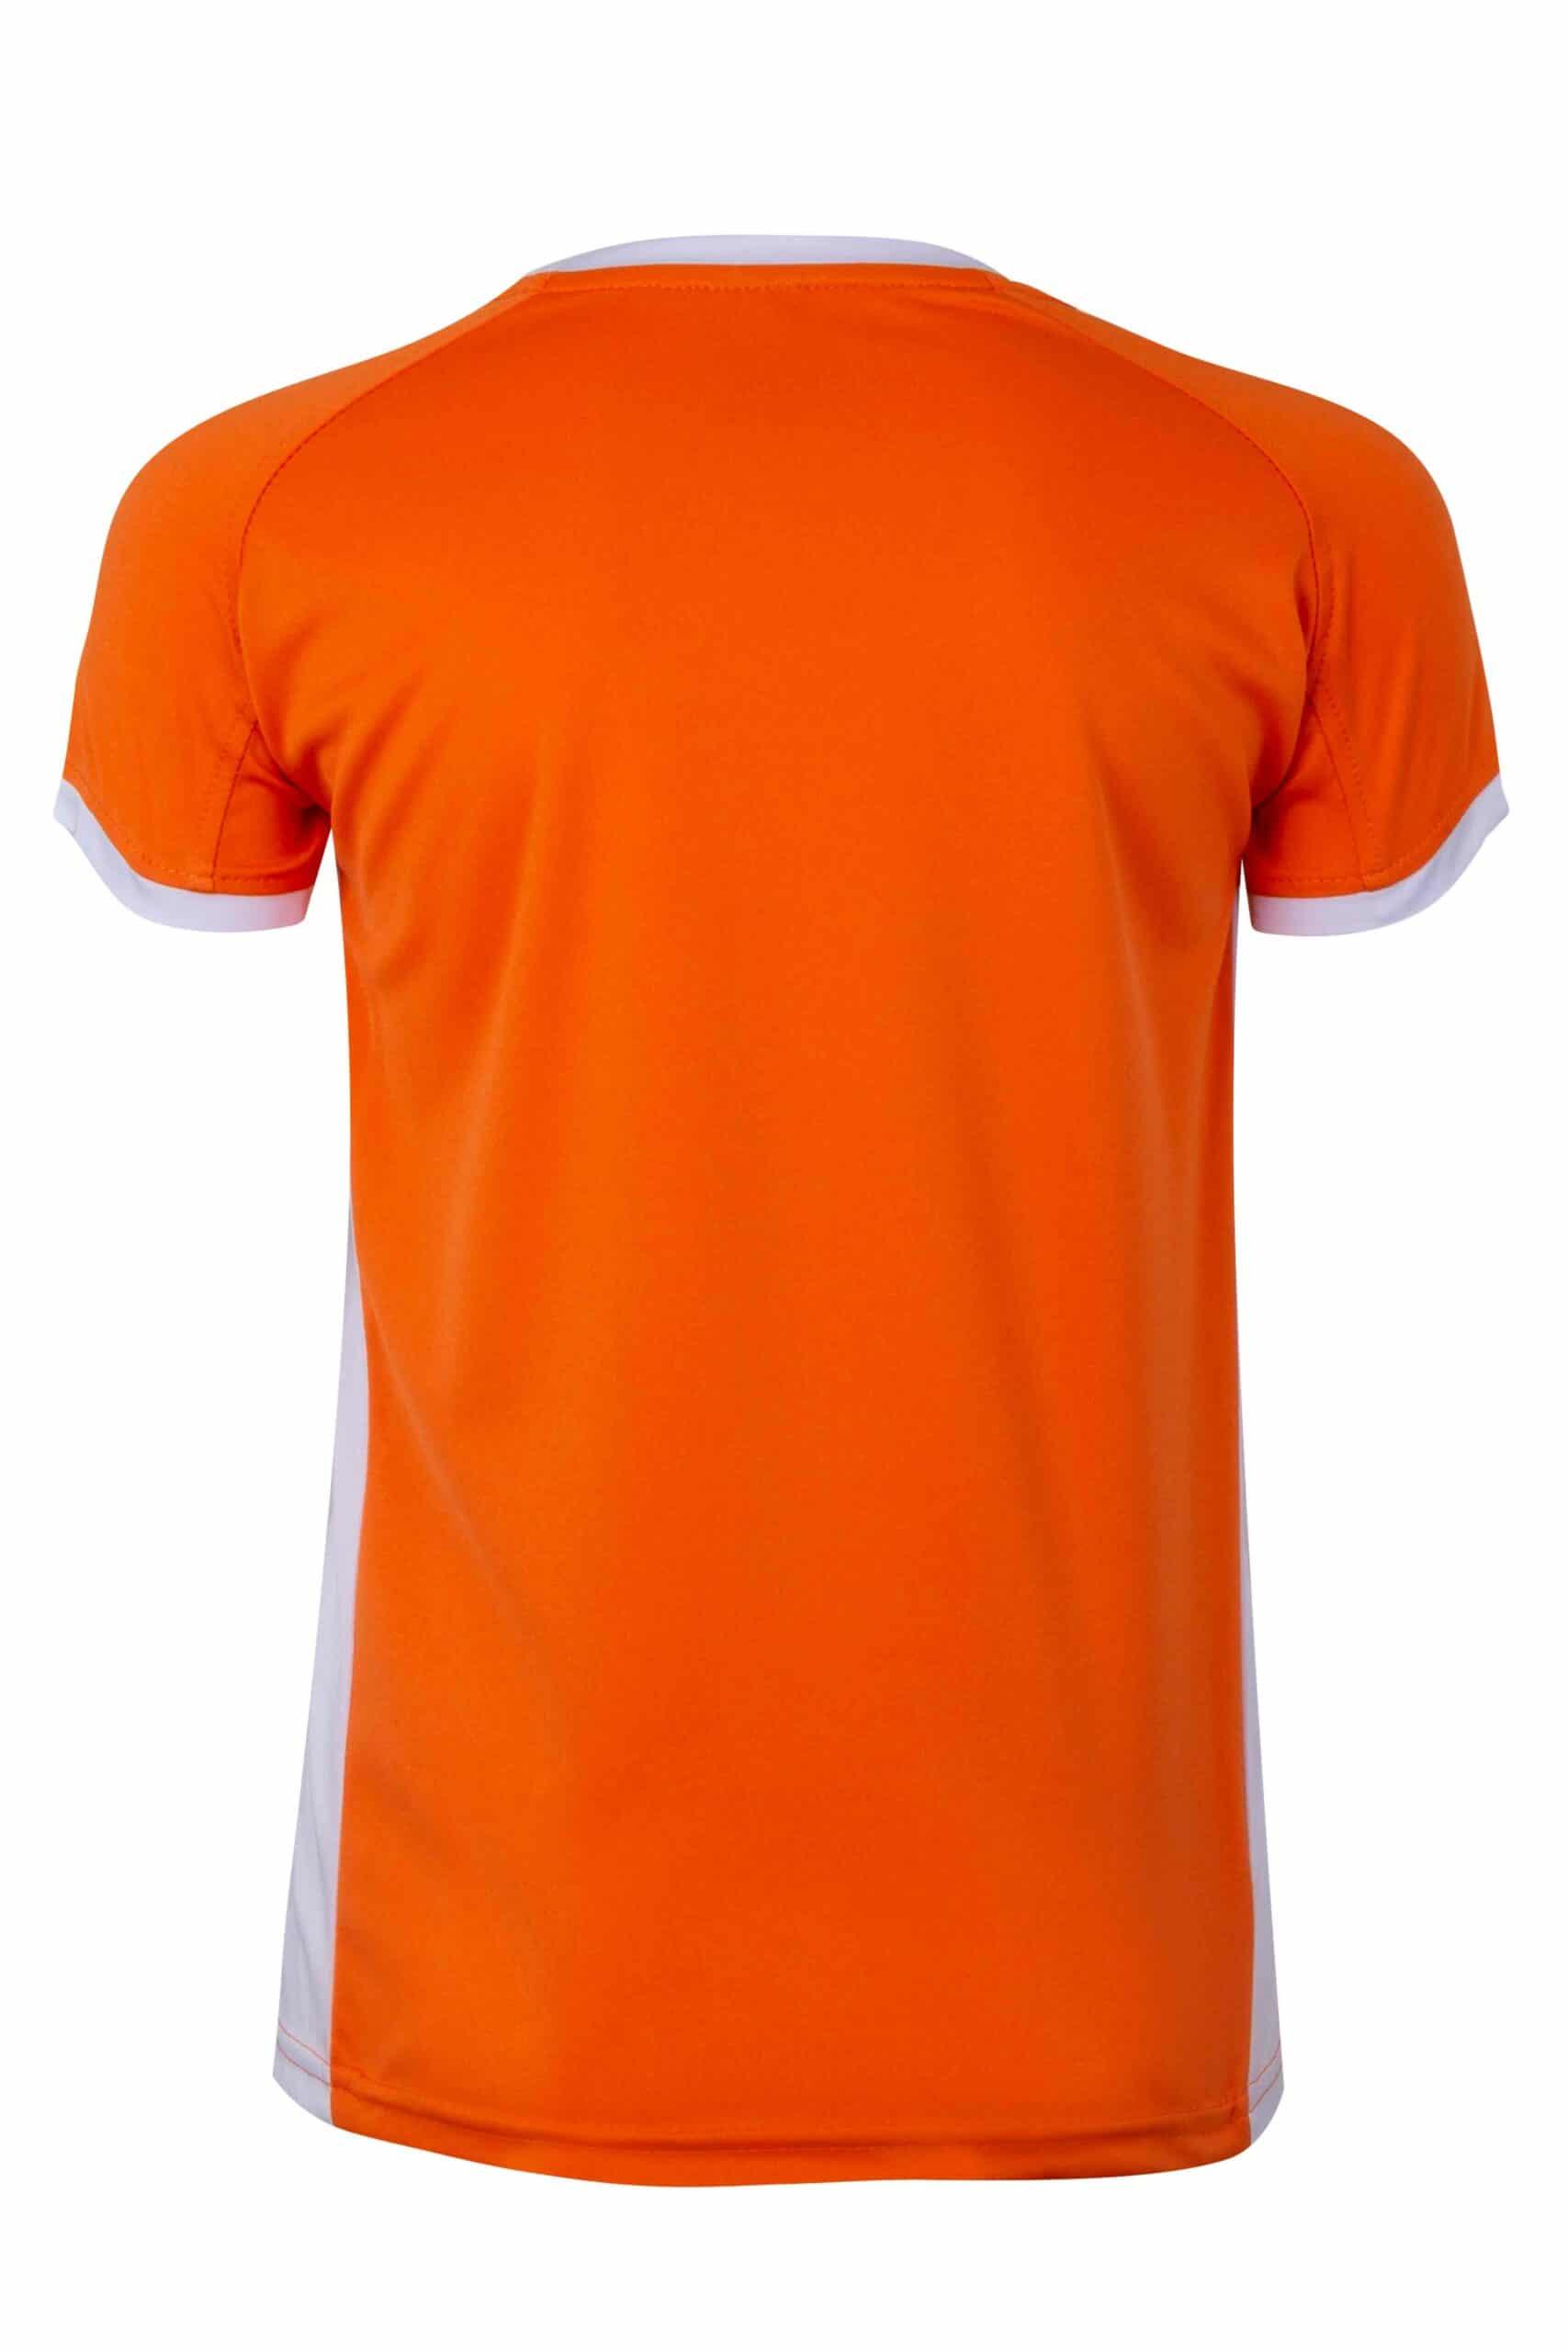 Mukua Mk531v Camiseta TÉcnica Manga Corta Bicolor NiÑo Orange White 2